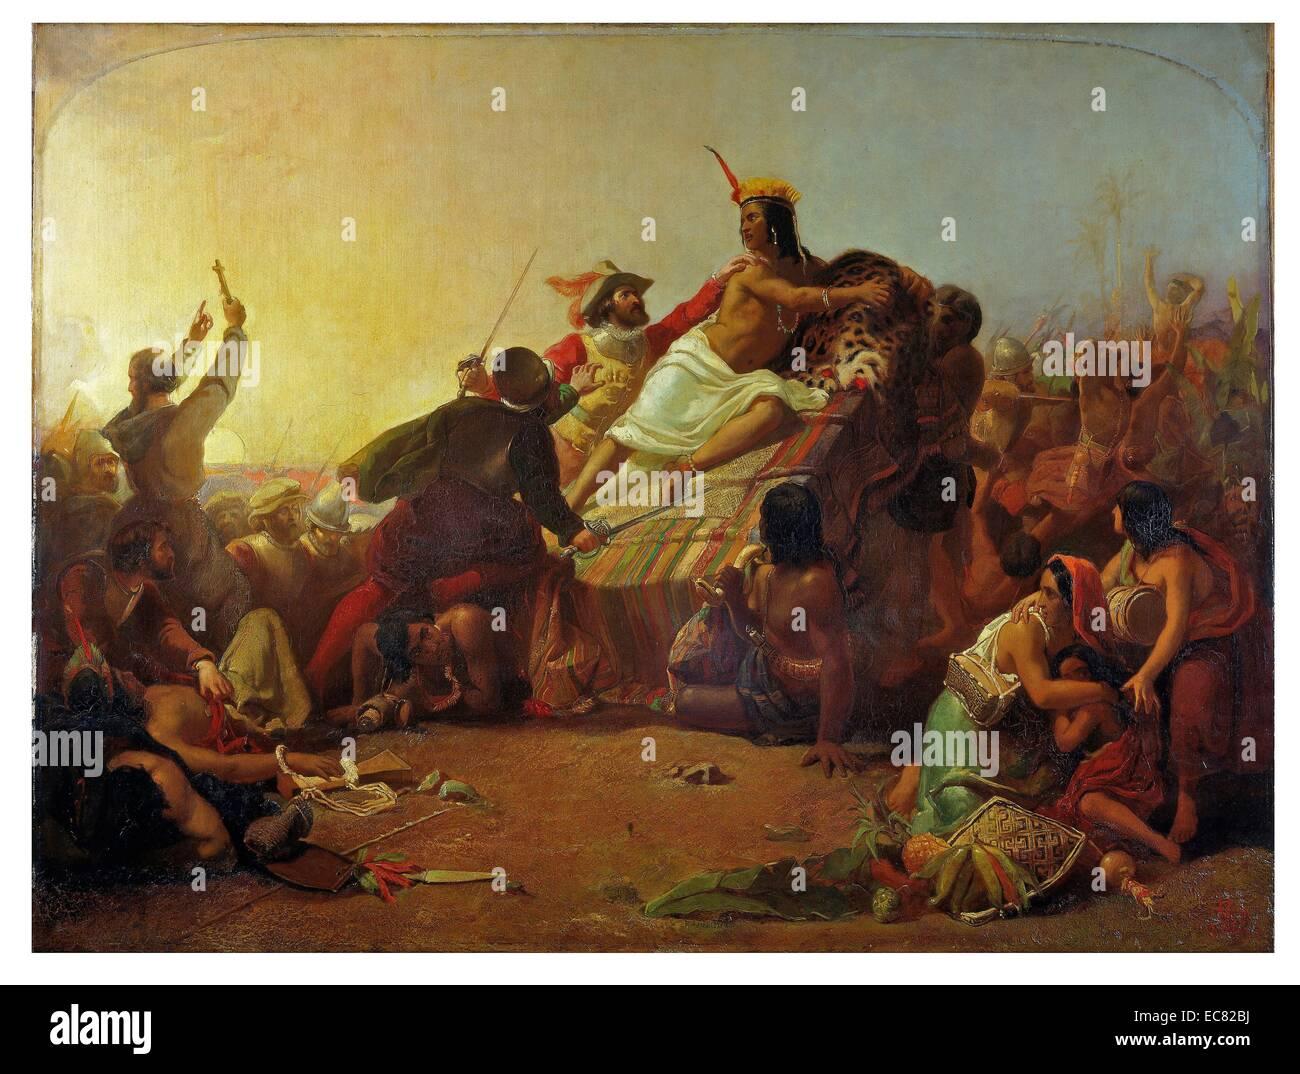 (Francisco) 'Pizarro Seizing the Inca of Peru' Millais 1846. - Stock Image